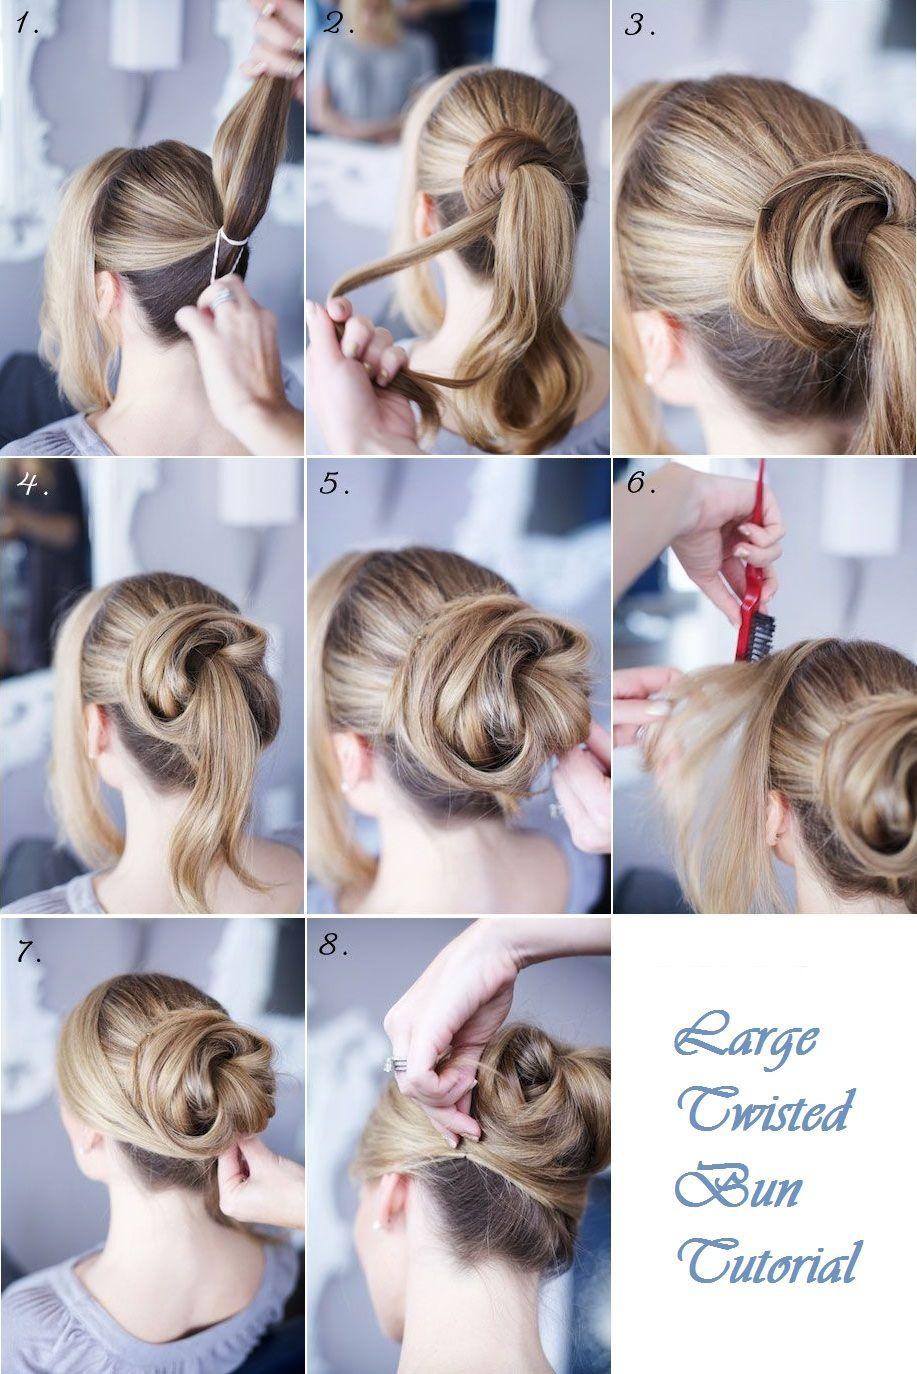 Large twisted bun tutorial things to wear pinterest bun